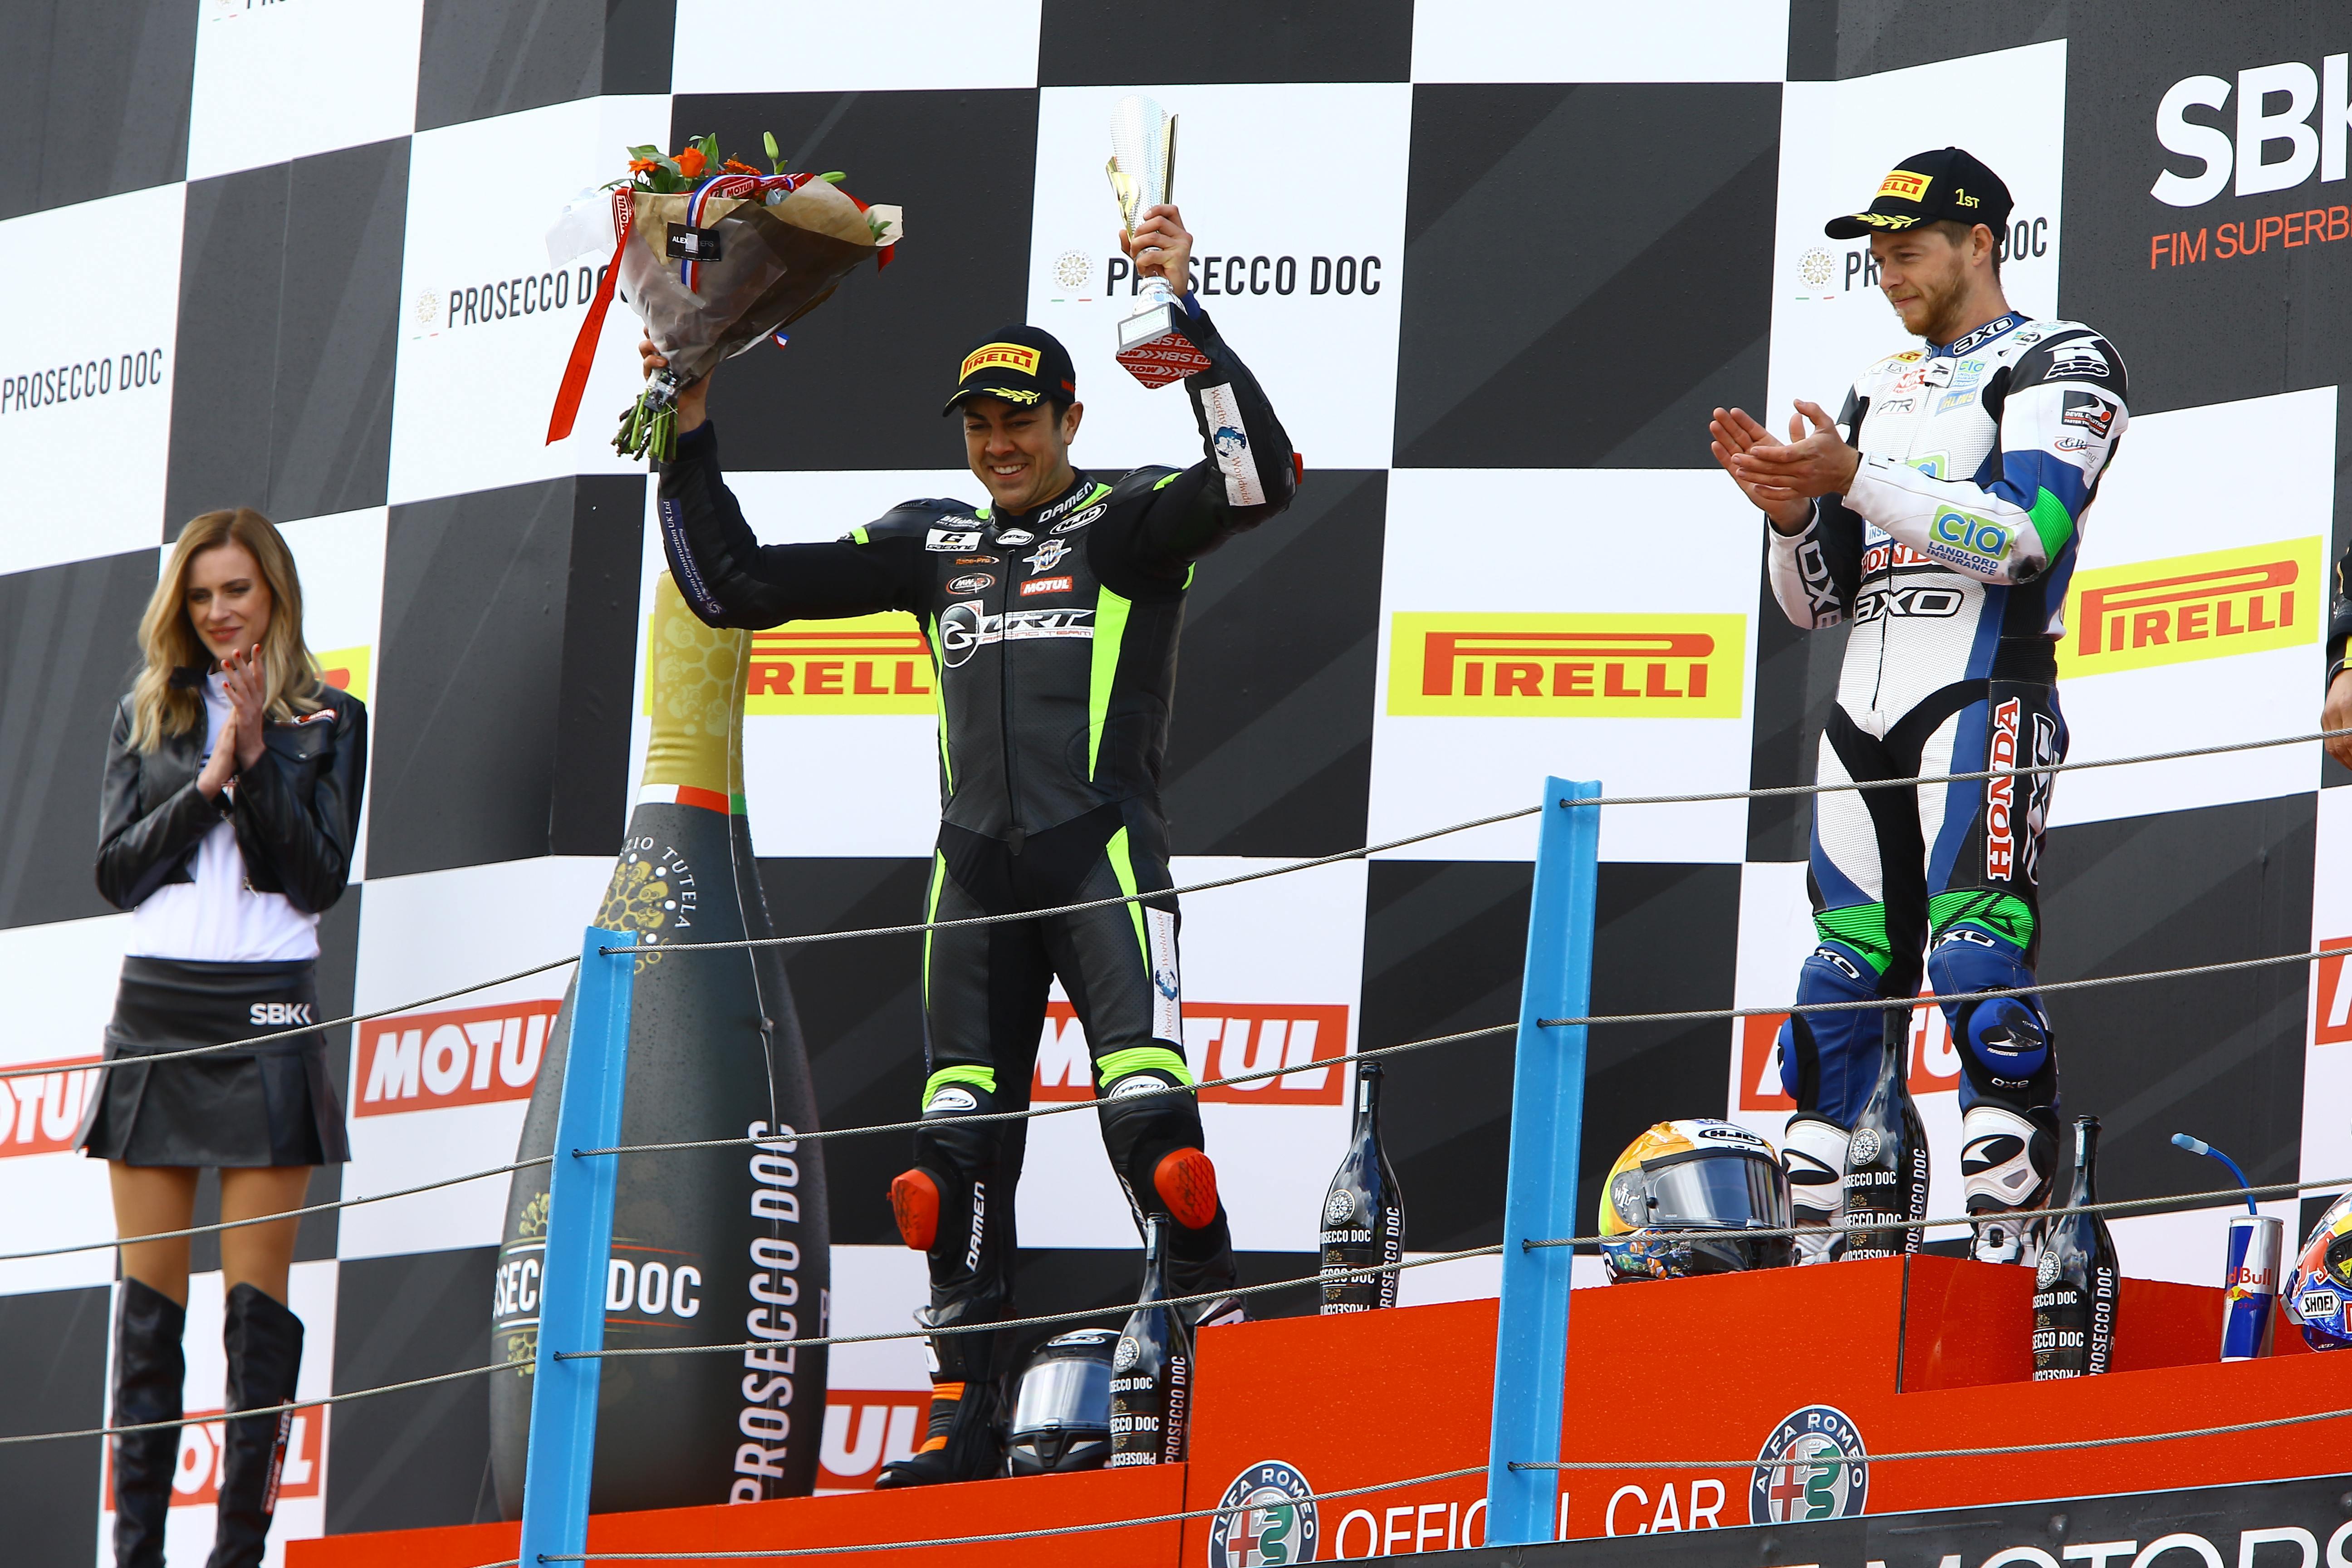 Assen_ned_ssp_race 387.JPG